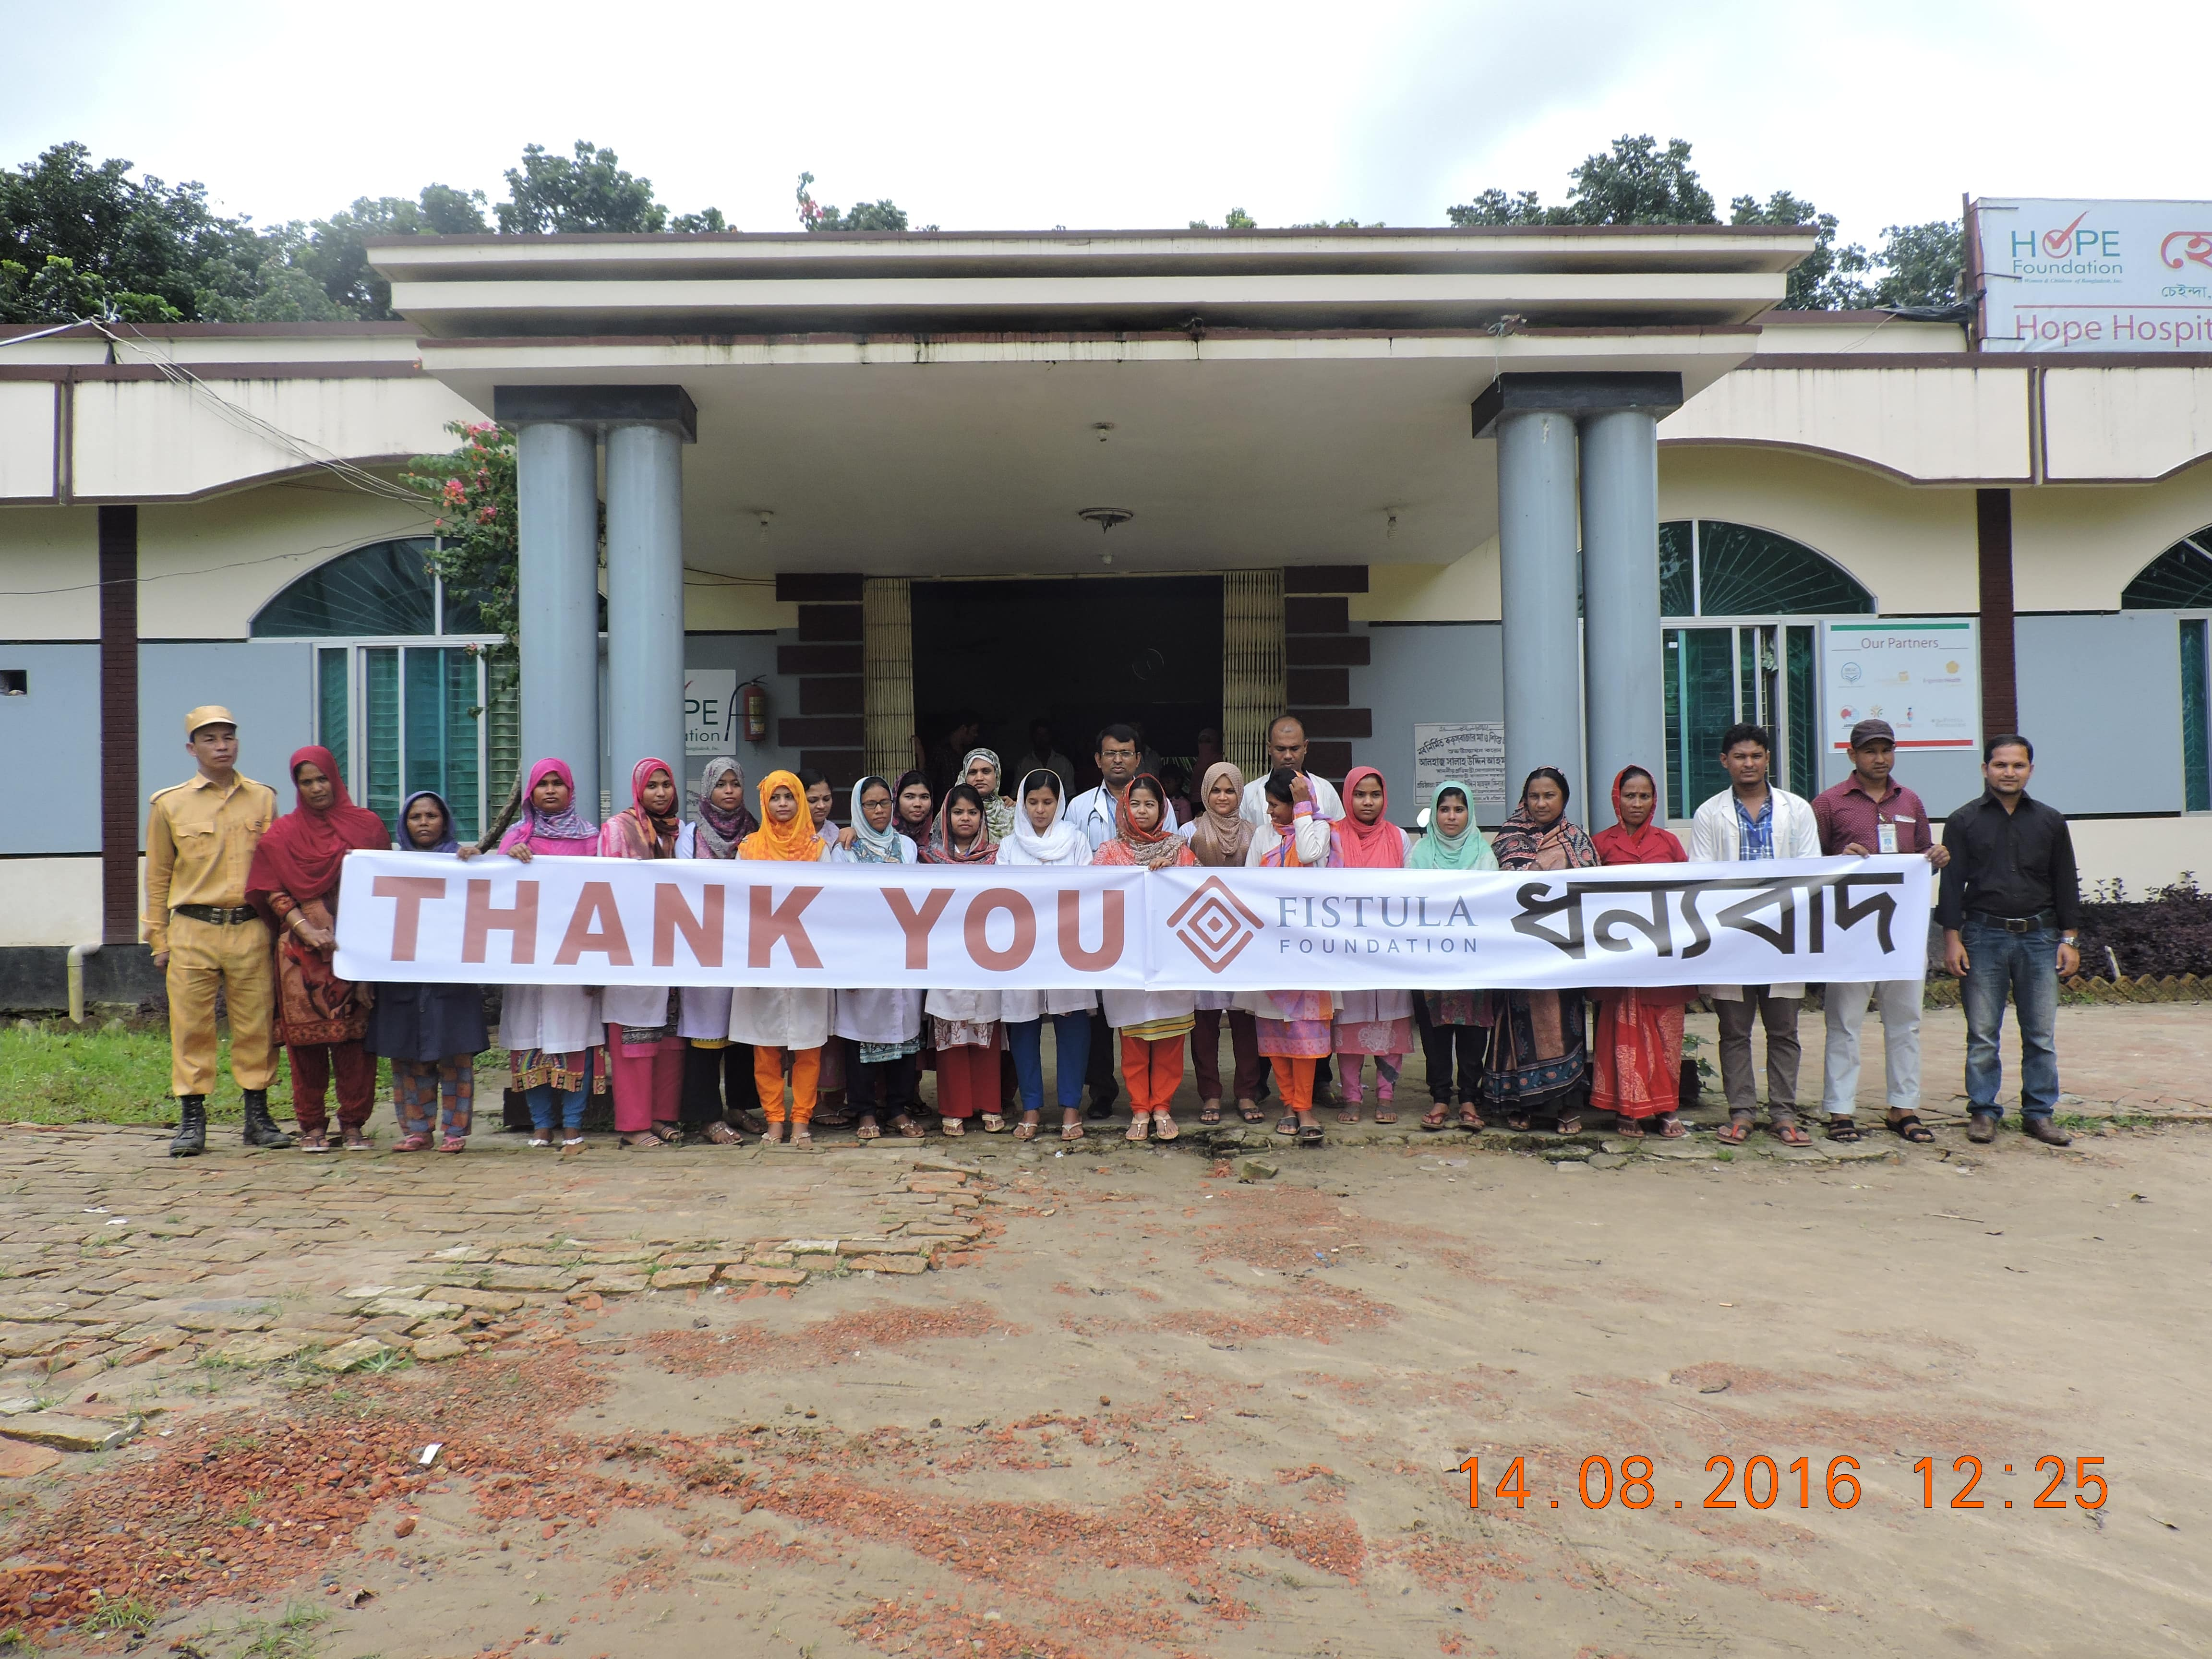 HOPE Bangladesh - Thank you!